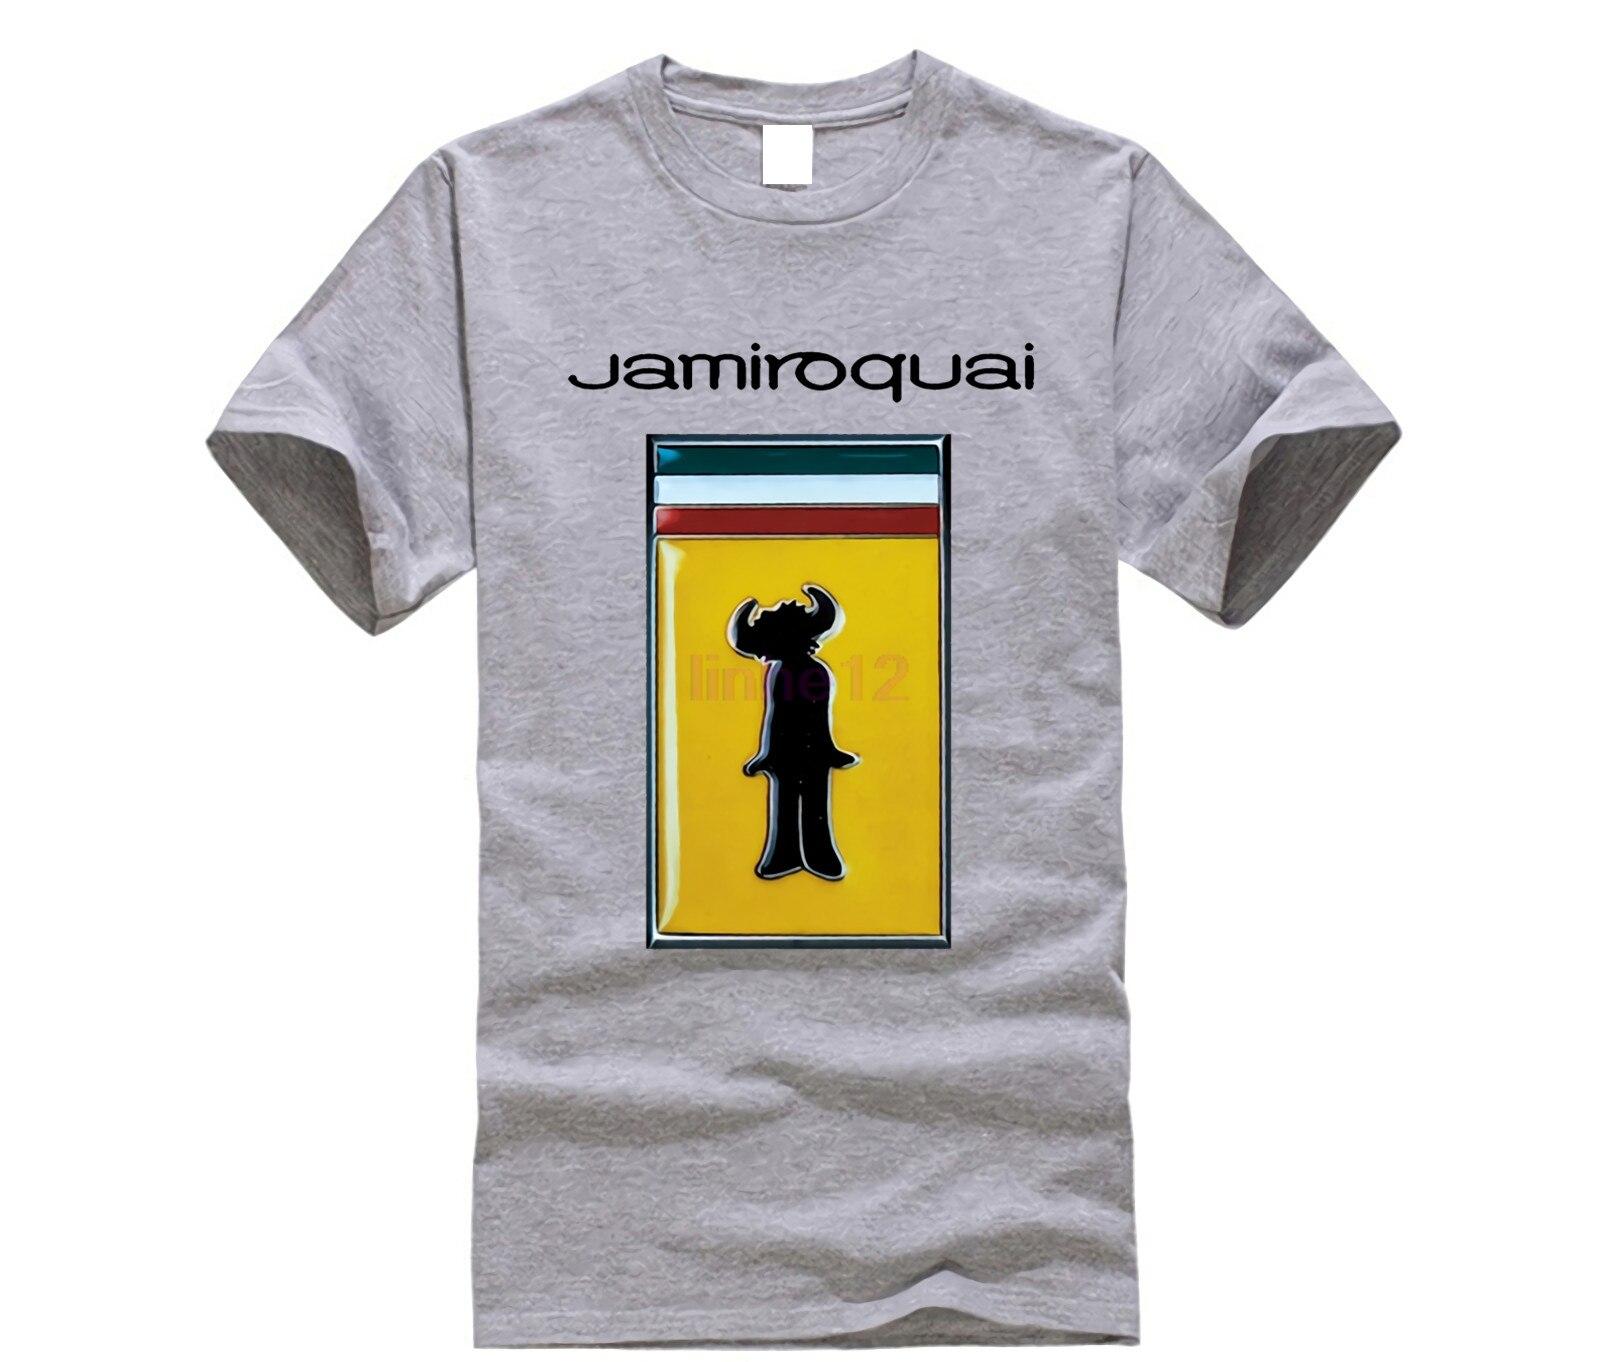 c0e4e178dcd85 US $7.89 21% OFF|New Jamiroquai Jay Kay Soul Funk Singer Men raglan T Shirt  pattern Print T Shirt Harajuku mens ringer tee shirt Short Sleeve-in ...